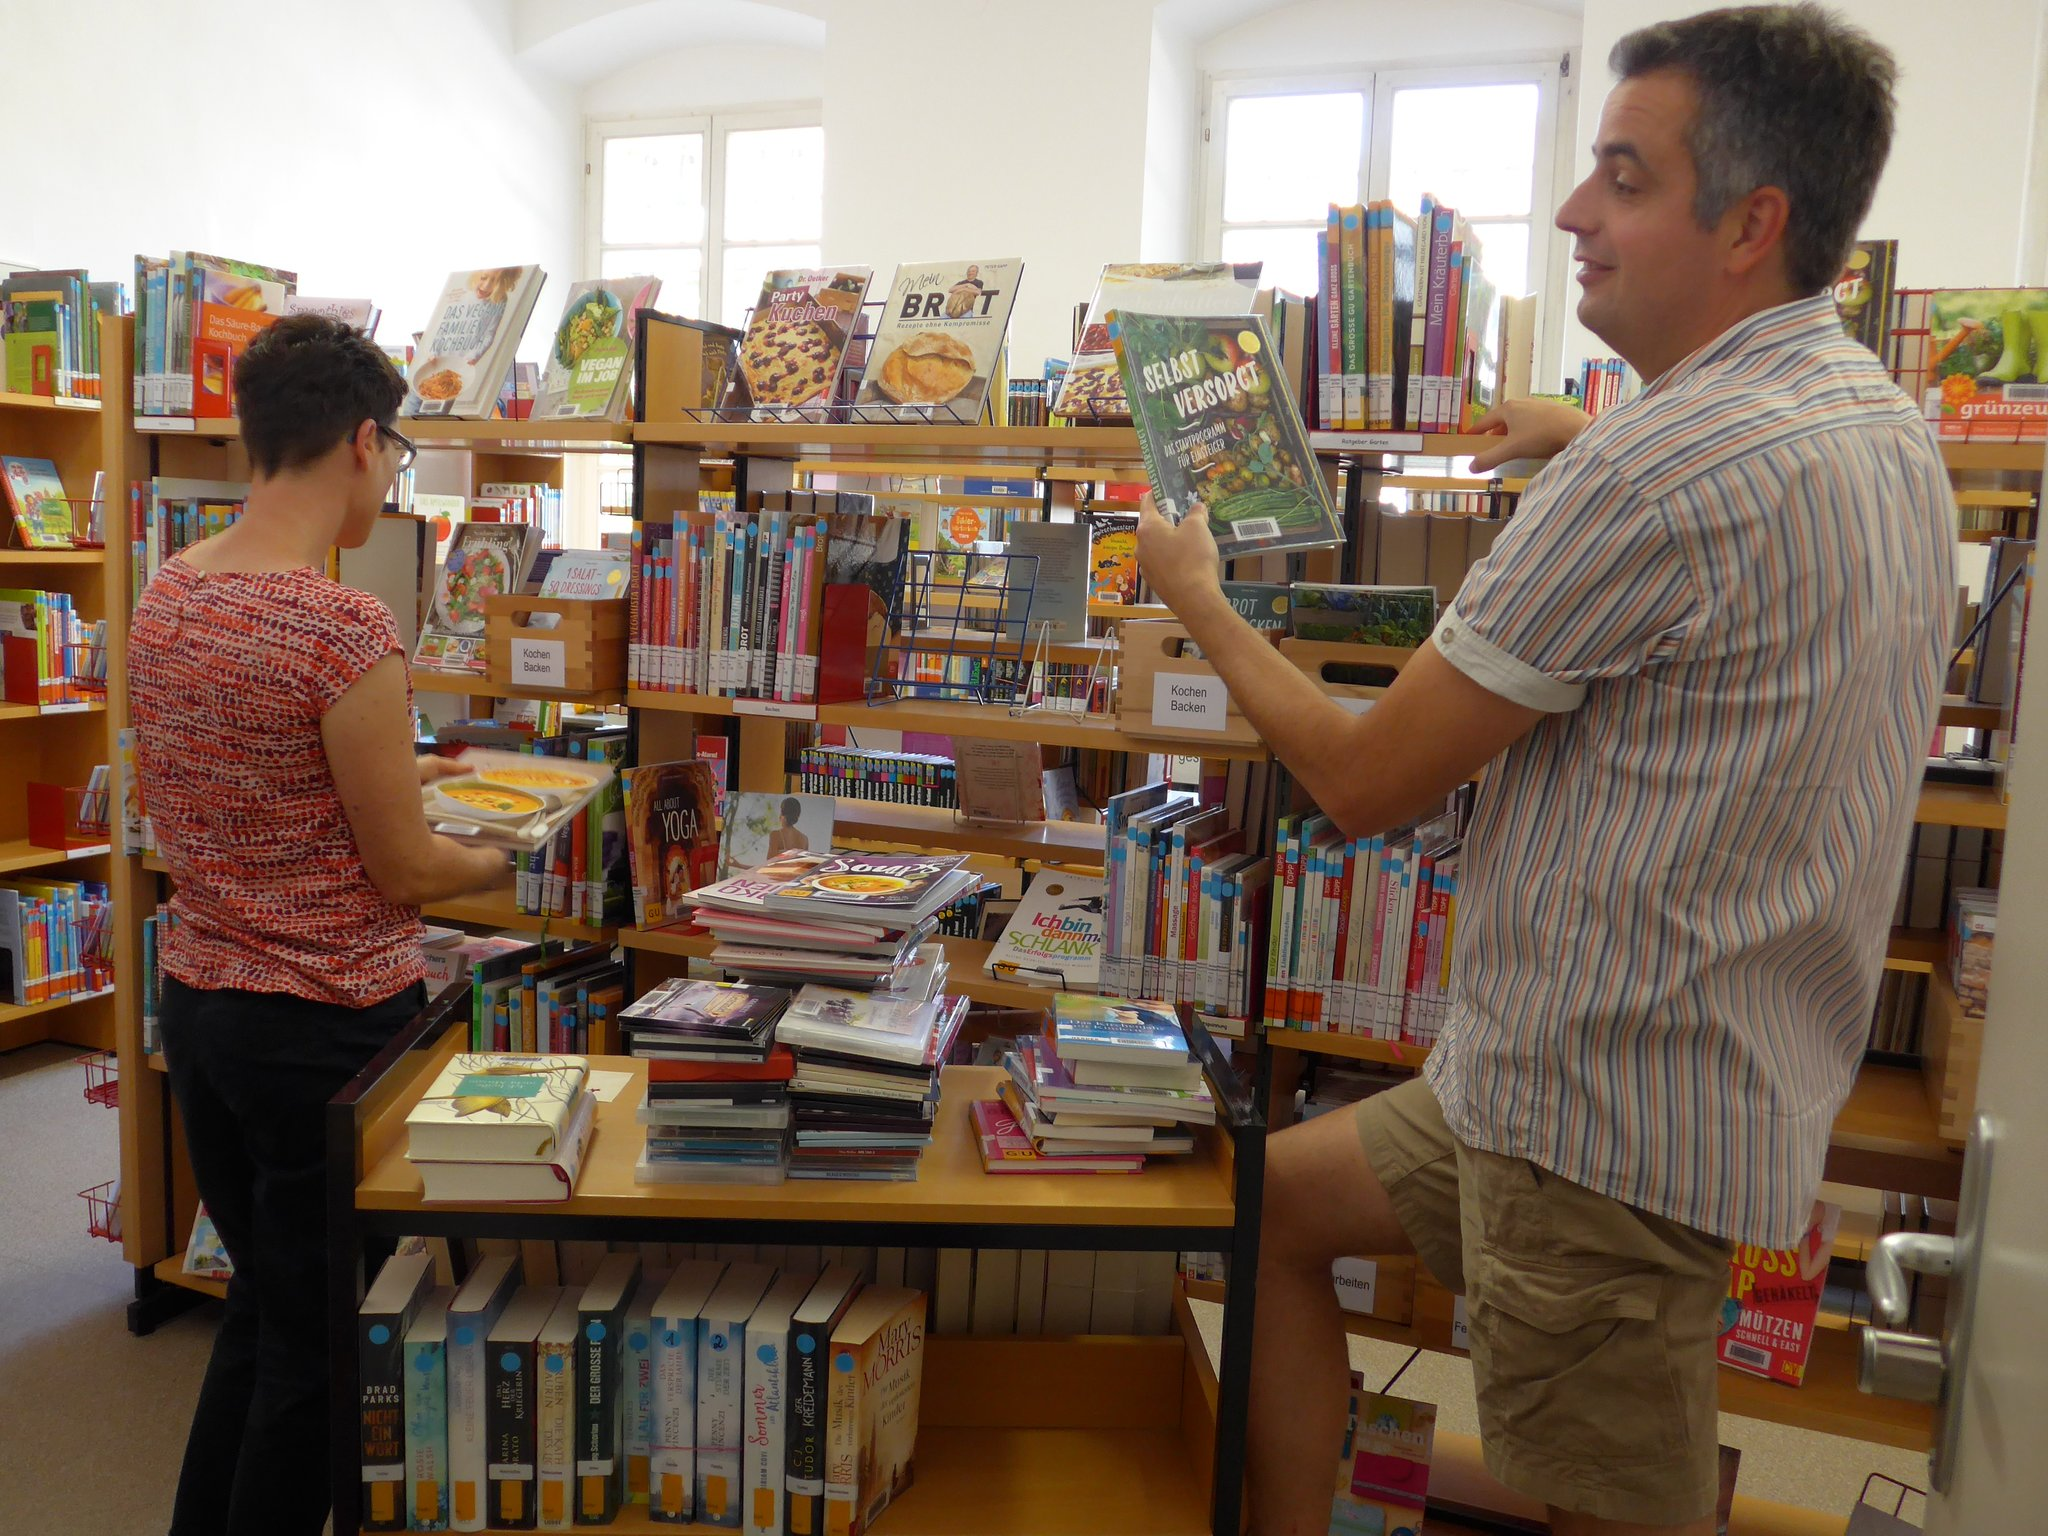 Bücherei-Regale sind neu gefüllt:: Angebot der KÖB Leimersheim auch ...